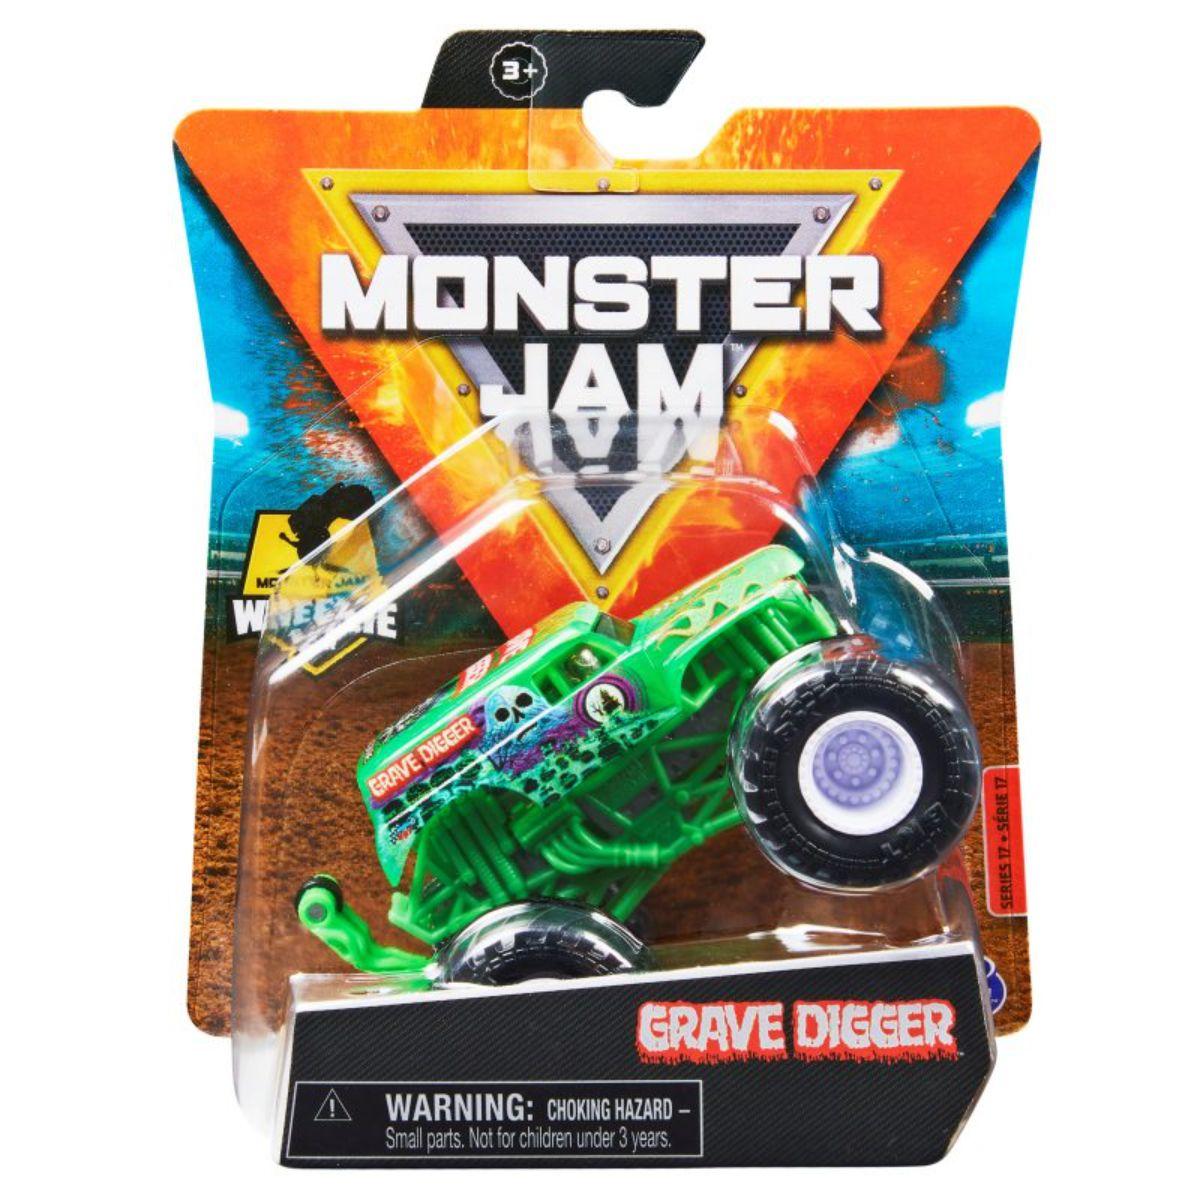 Masinuta Monster Jam, Scara 1:64, Dragon, 20130585